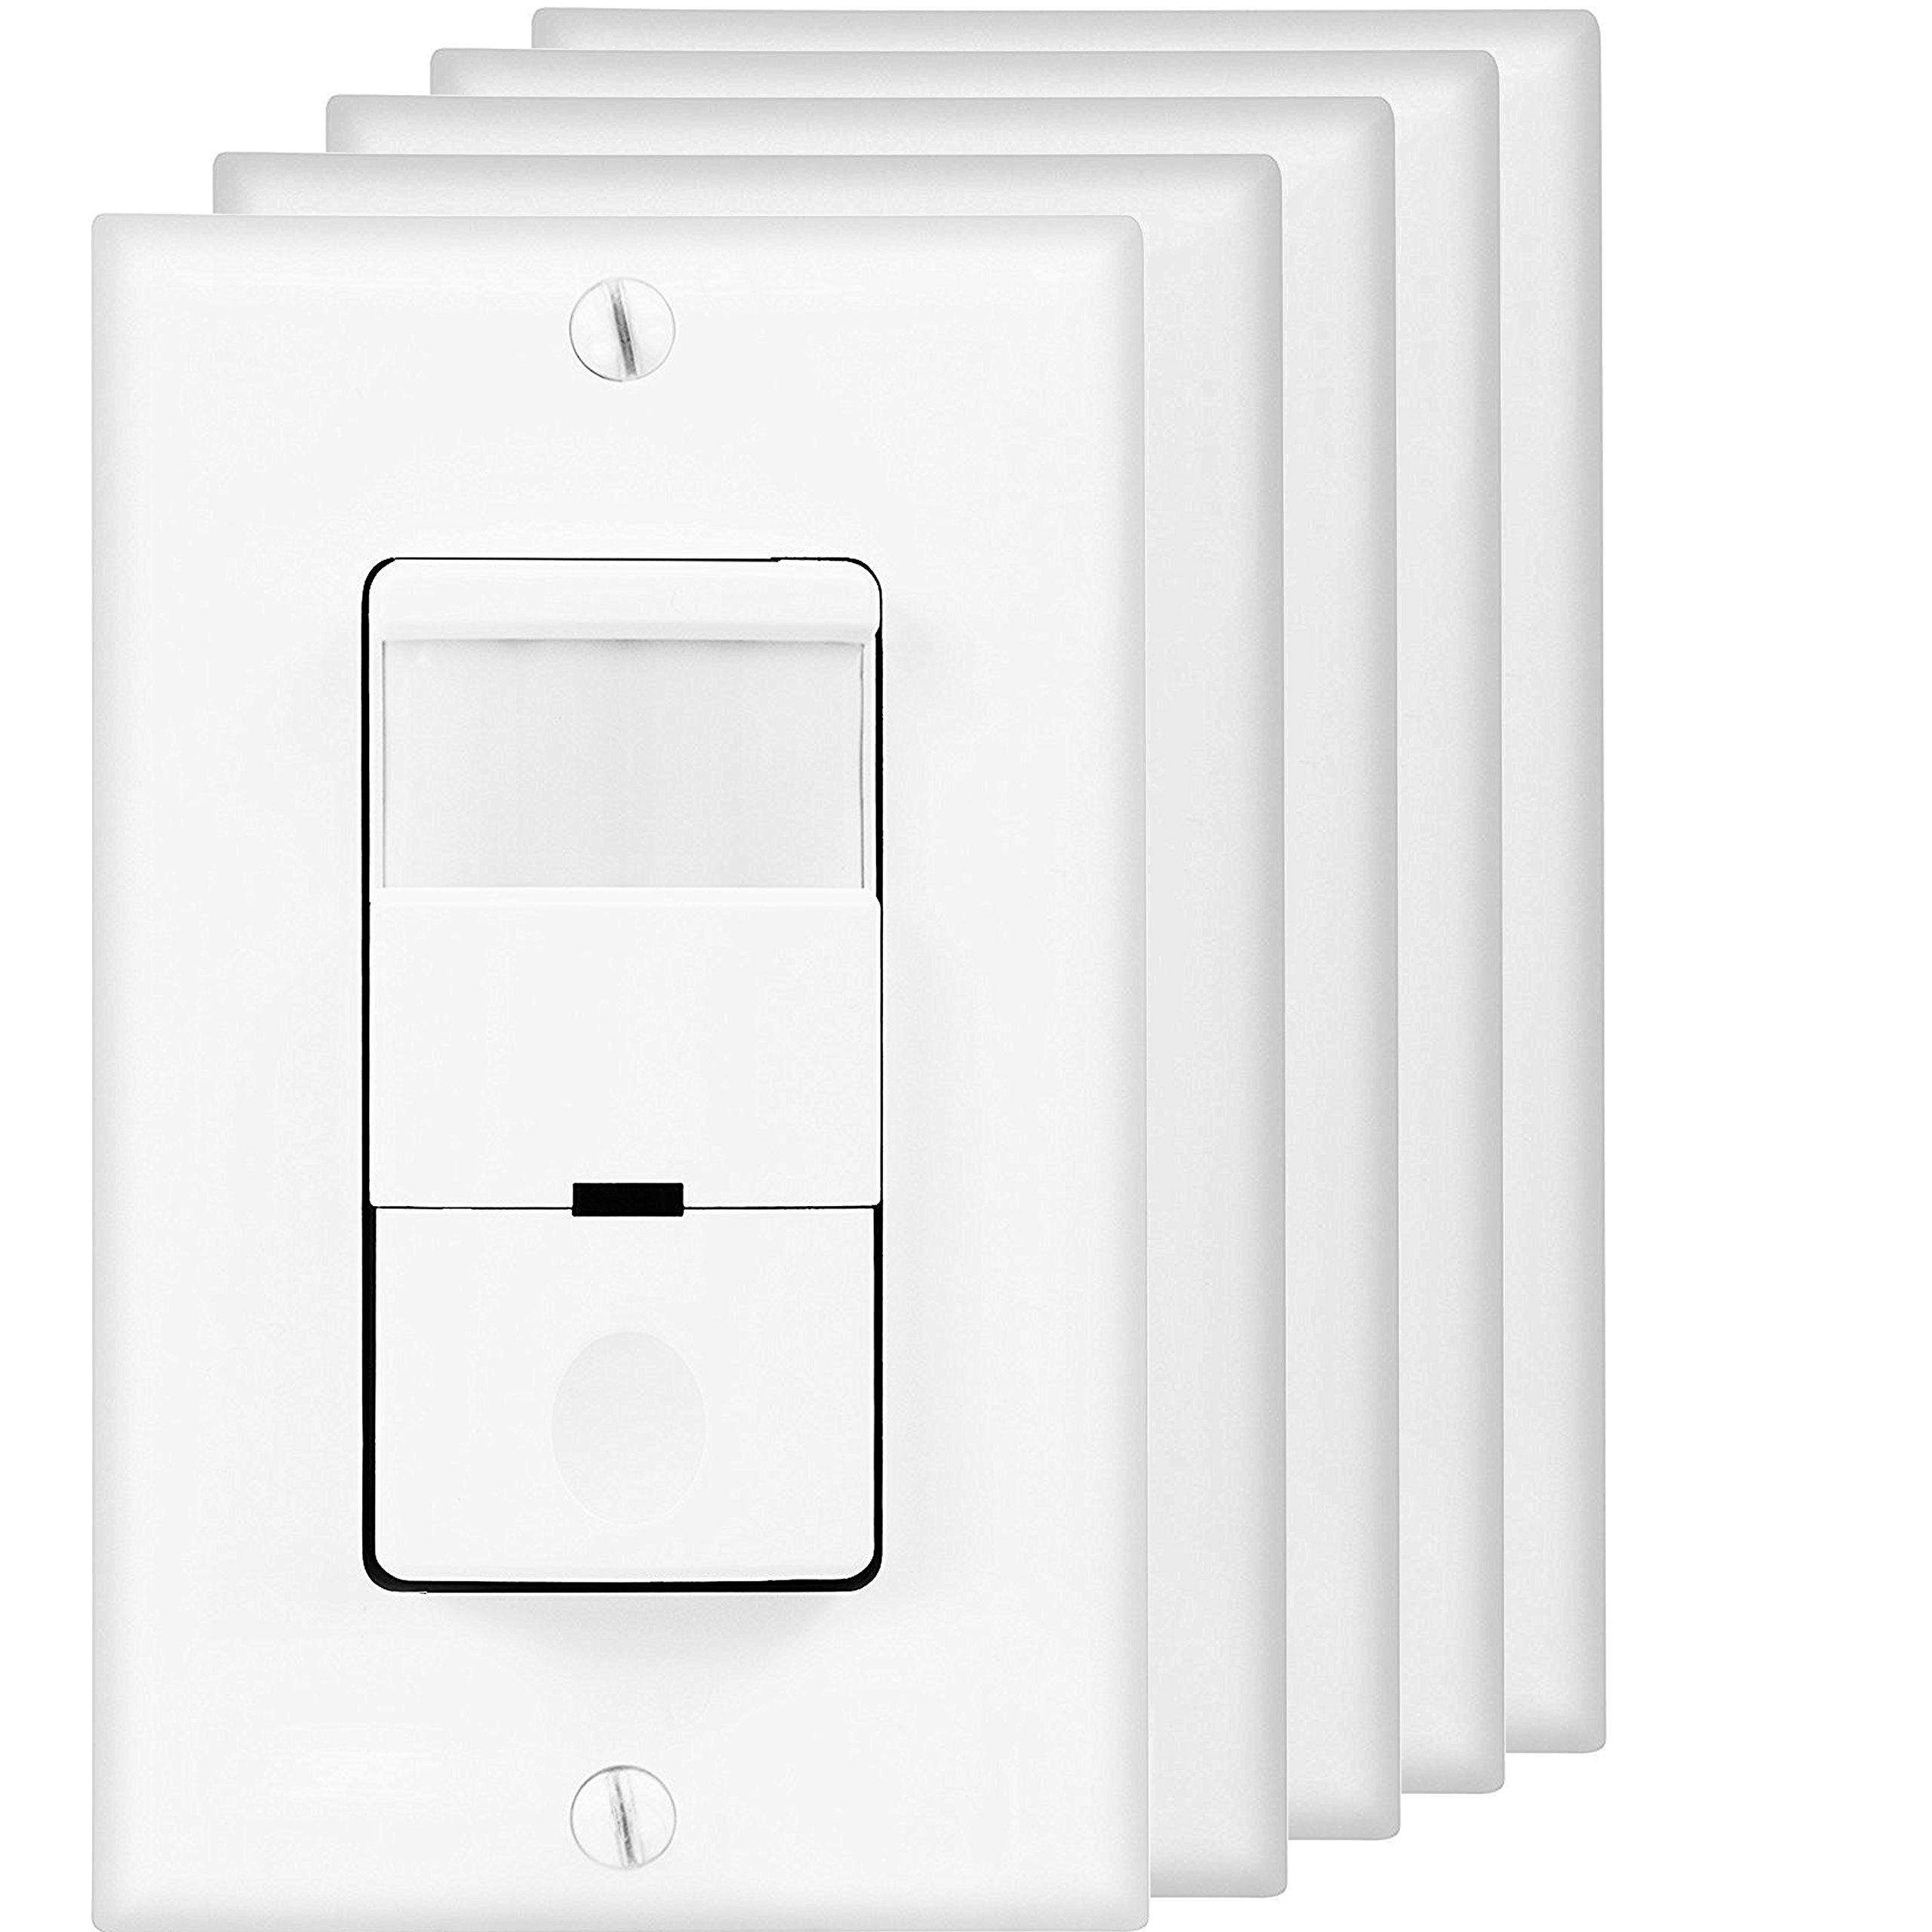 Top Greener TDOS5-W-5PCS Occupancy Sensor Switch, PIR Motion Sensor Switch, Motion Detector Switch, Light Switch Sensor (Pack of 5)